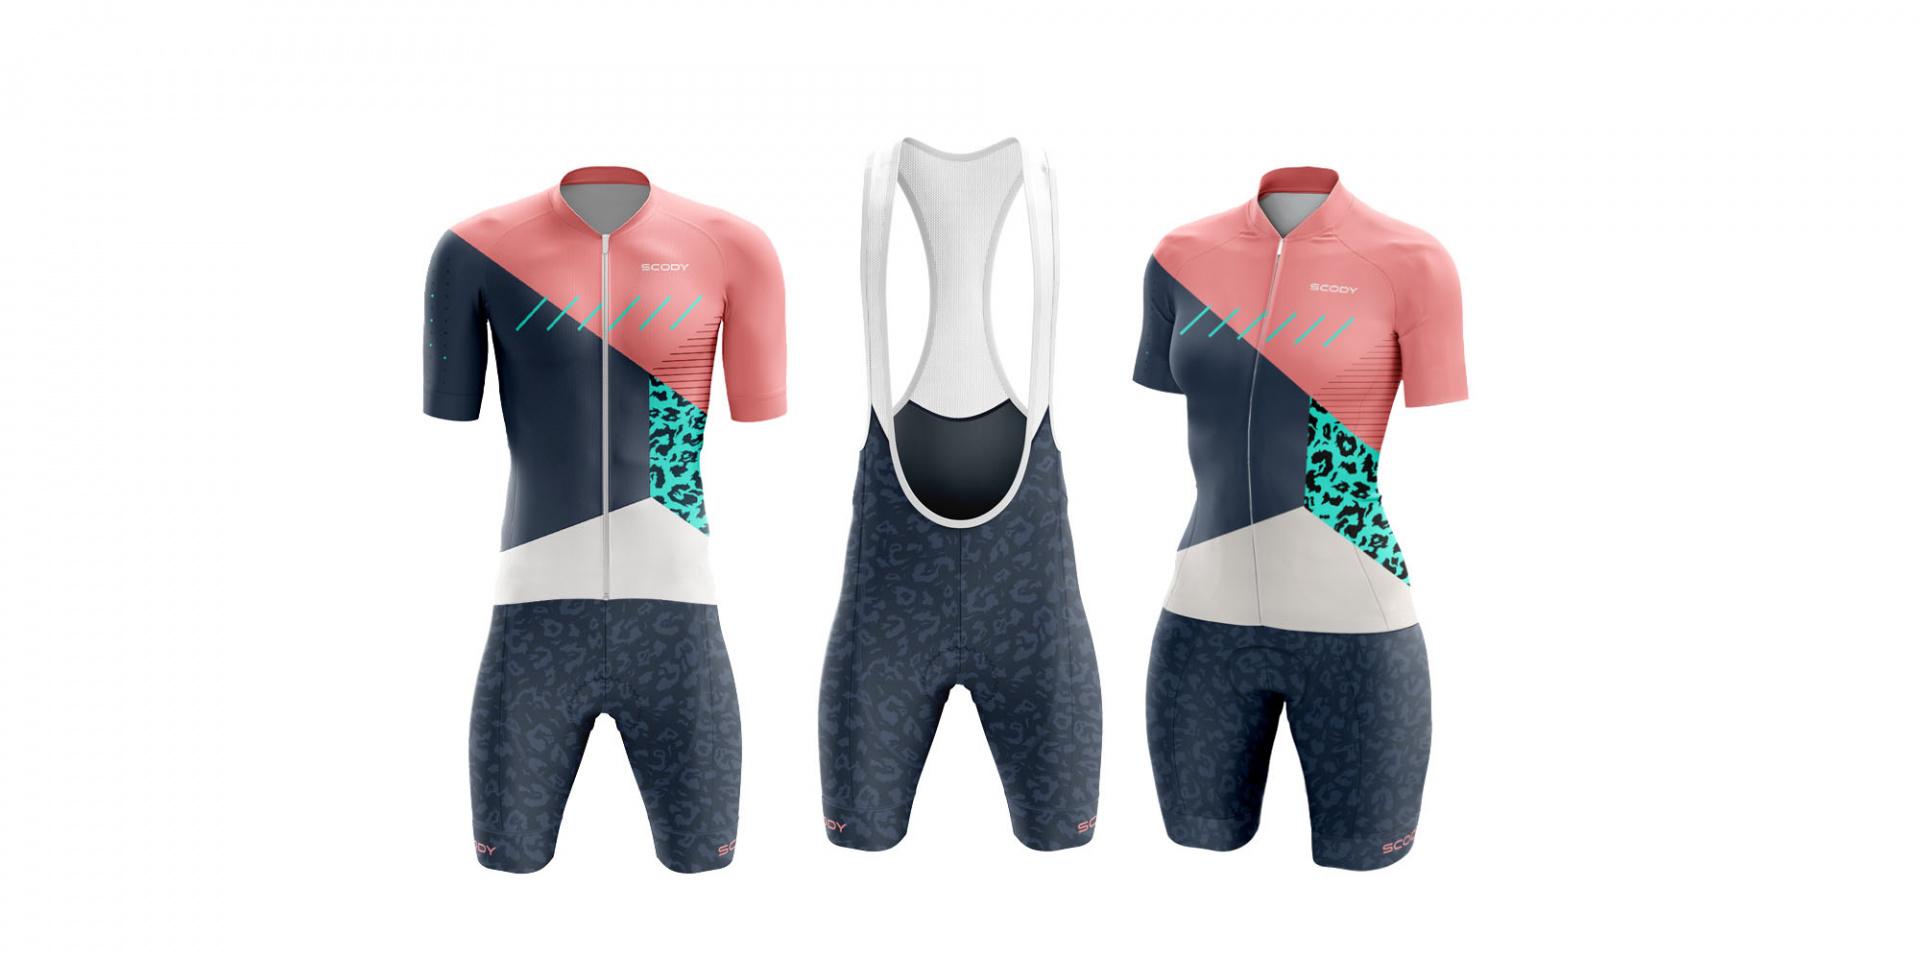 WILD-LIMITED-EDITION-OPTIMISE-CYCLING-BIB-CYCLING_CLOTHING.jpg